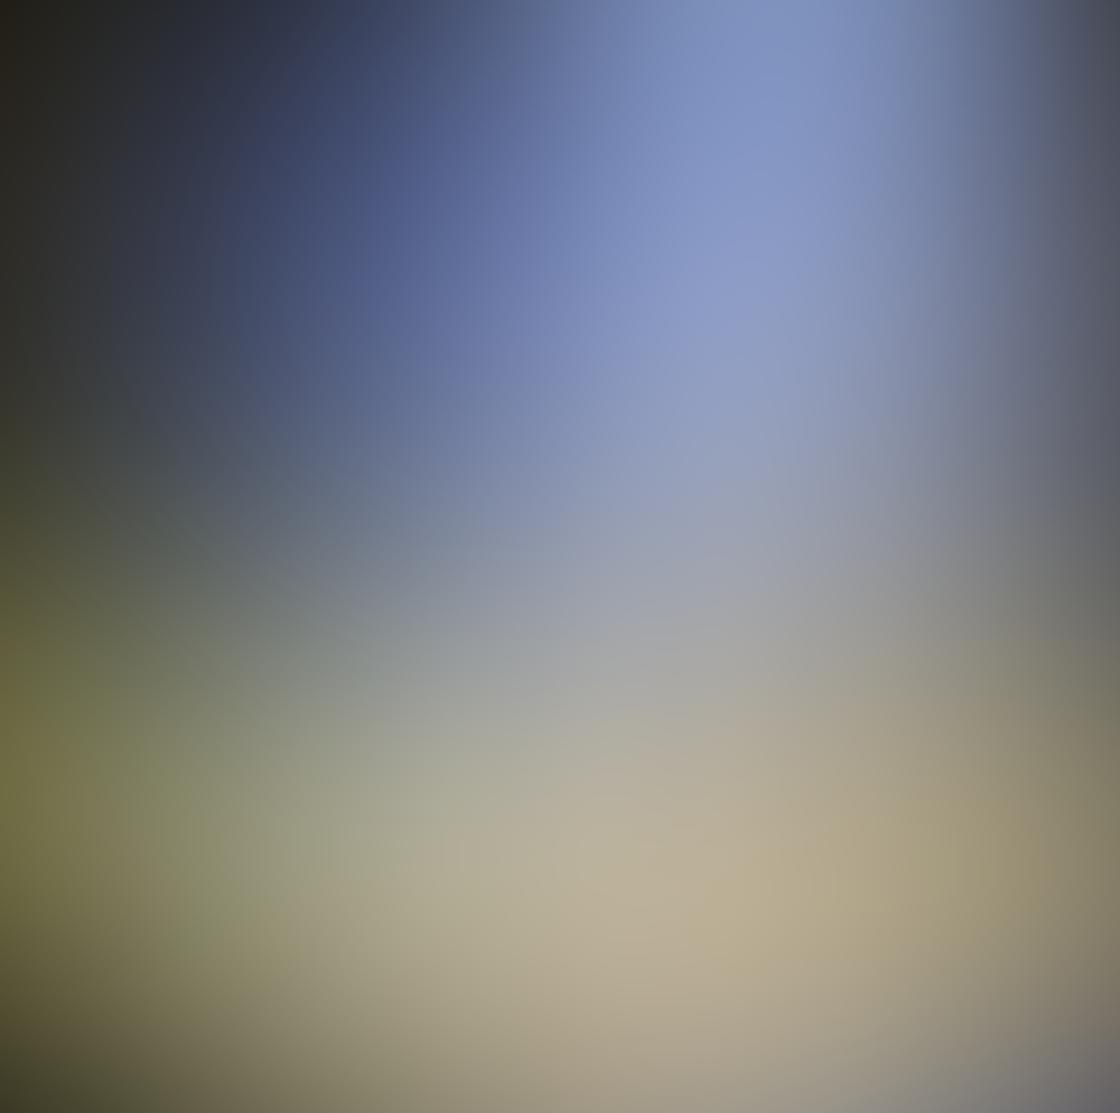 iPhone Photo Perspective 9